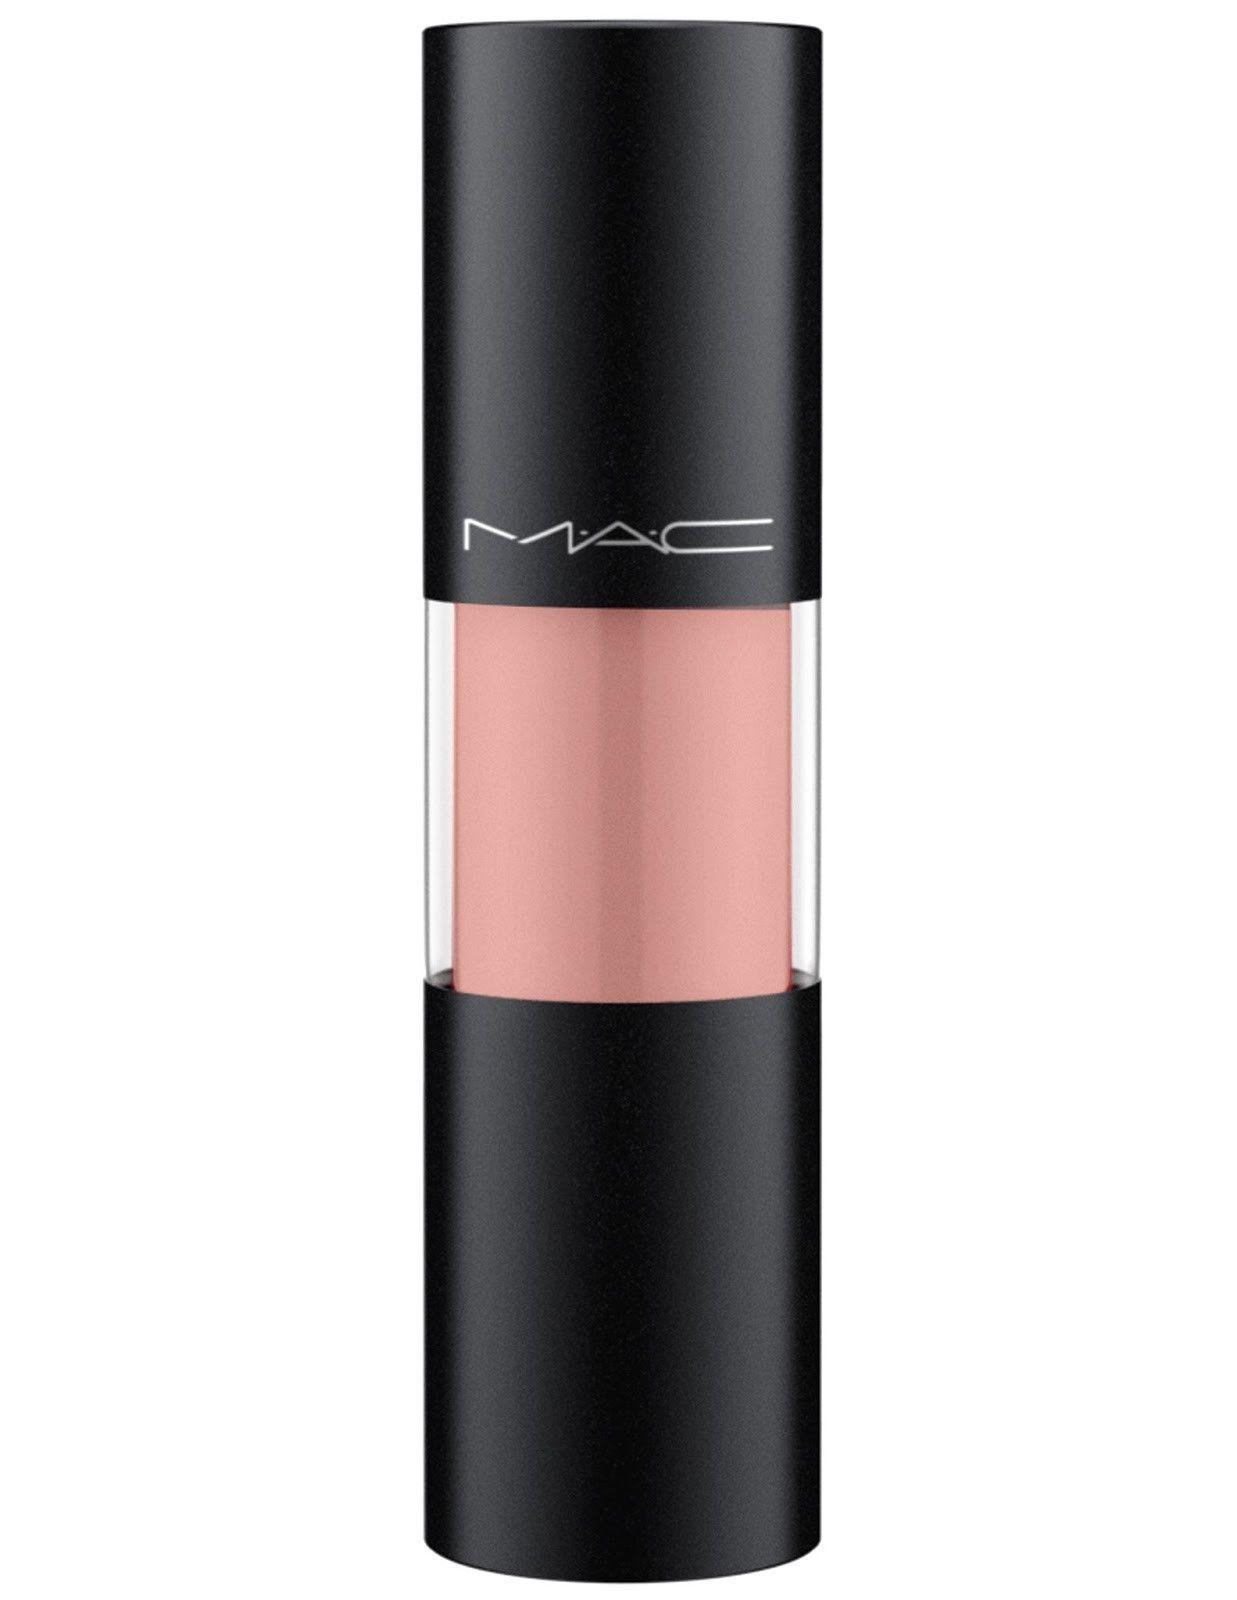 MAC Versicolour Stain Lipgloss ENERGY SHOT Pale Nude Pink NIB - $24.75